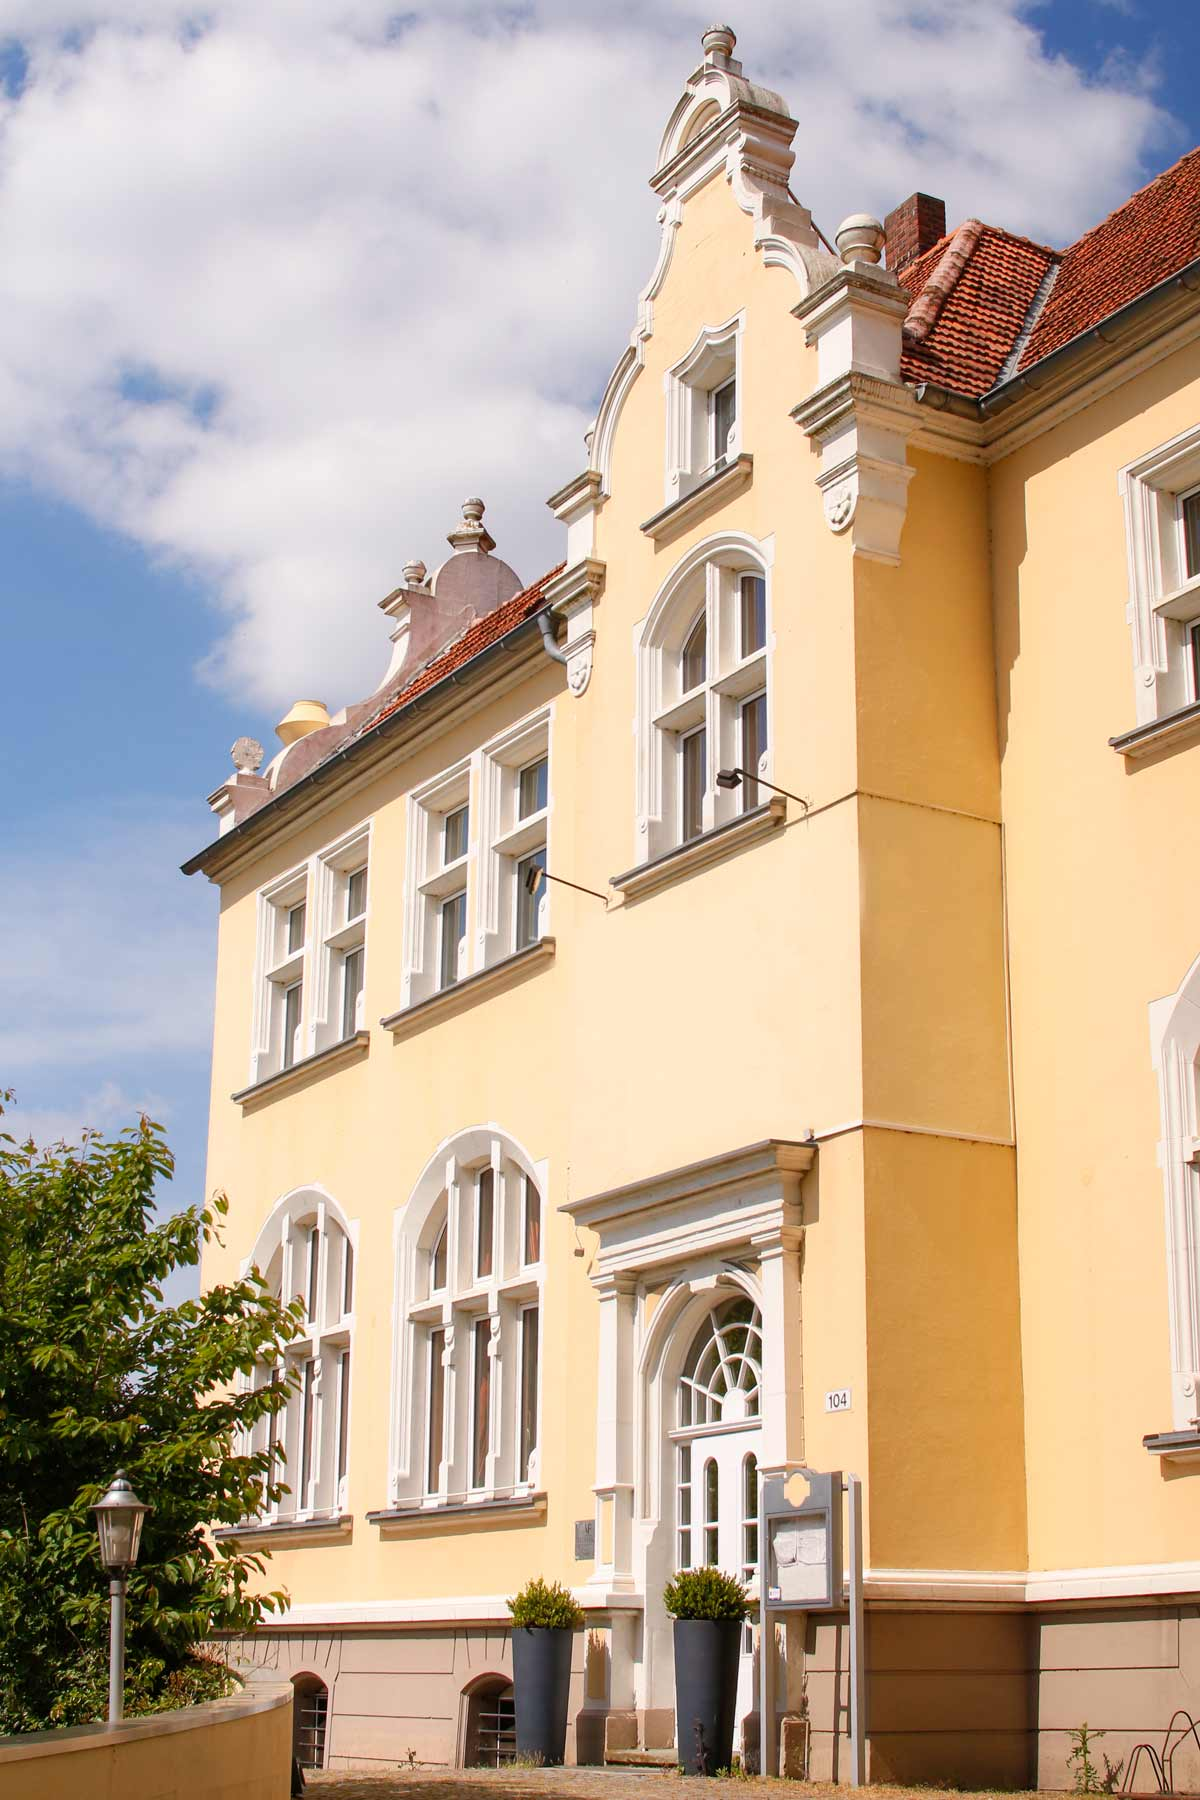 Kneisterei-Haus-front